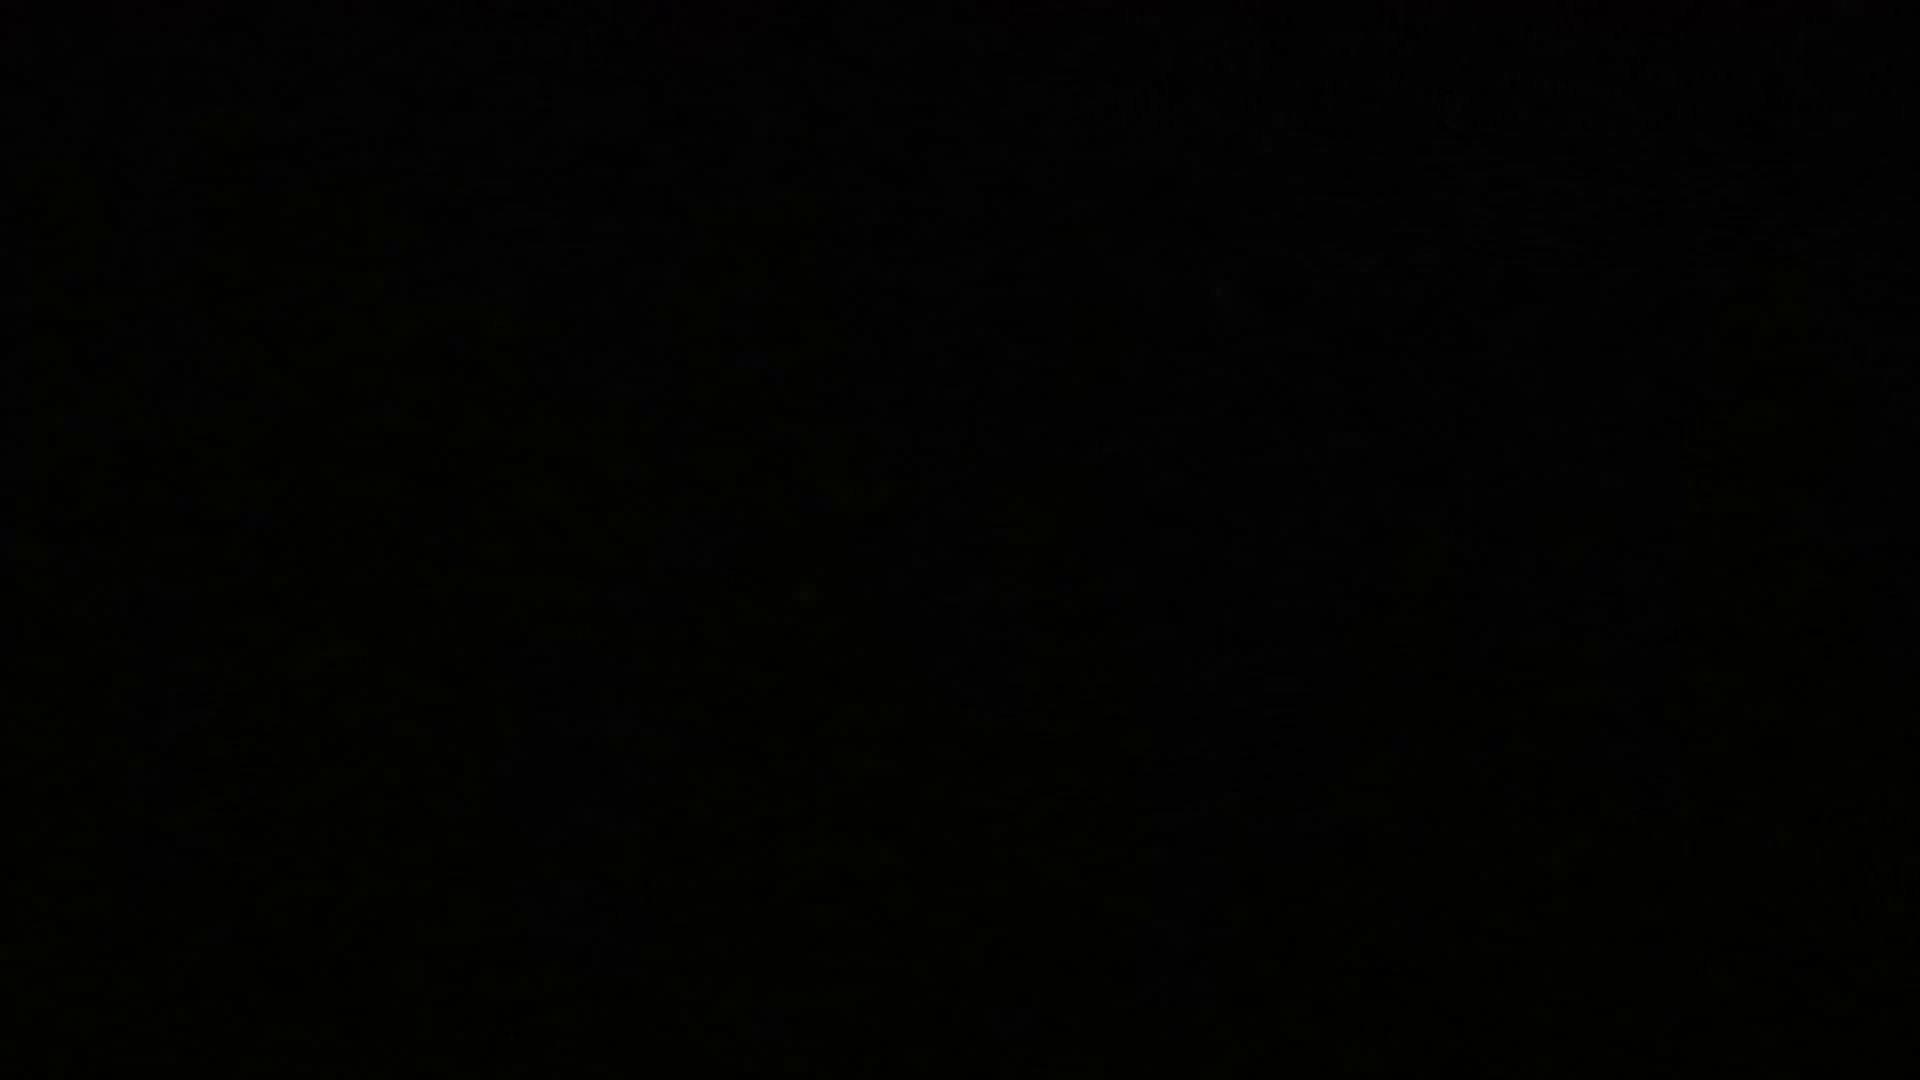 SPYさん初投稿!マンション覗き!5000K!ハイビジョン撮影VOL.05(元サッカー部員社会人) 投稿シリーズ ゲイAV画像 75連発 52